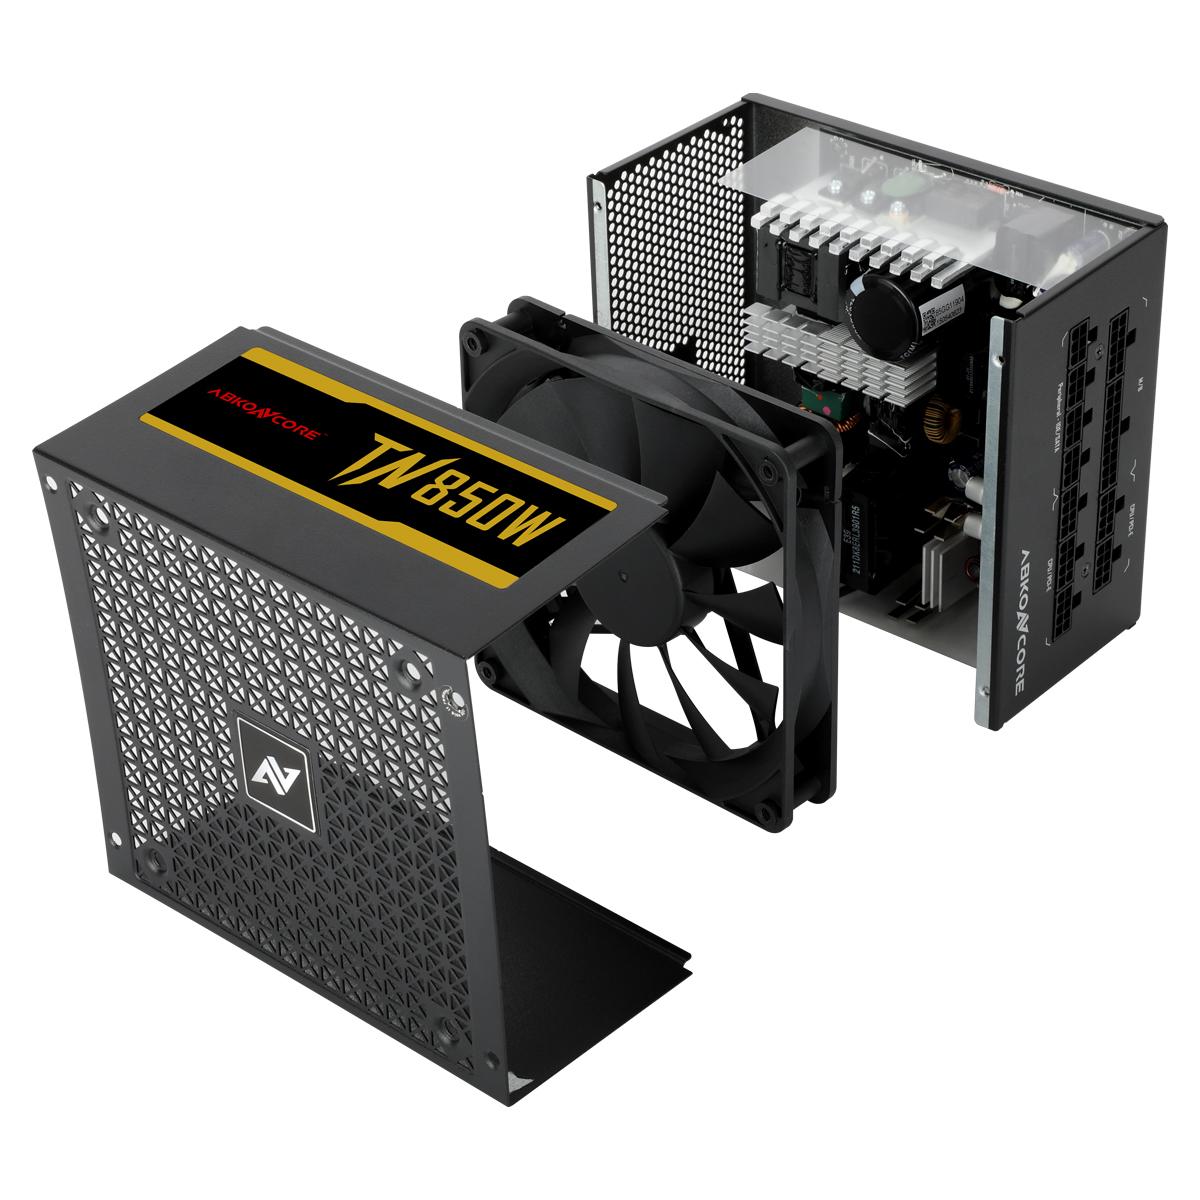 Fuente de alimentación TN850 Gold Modular imagen producto